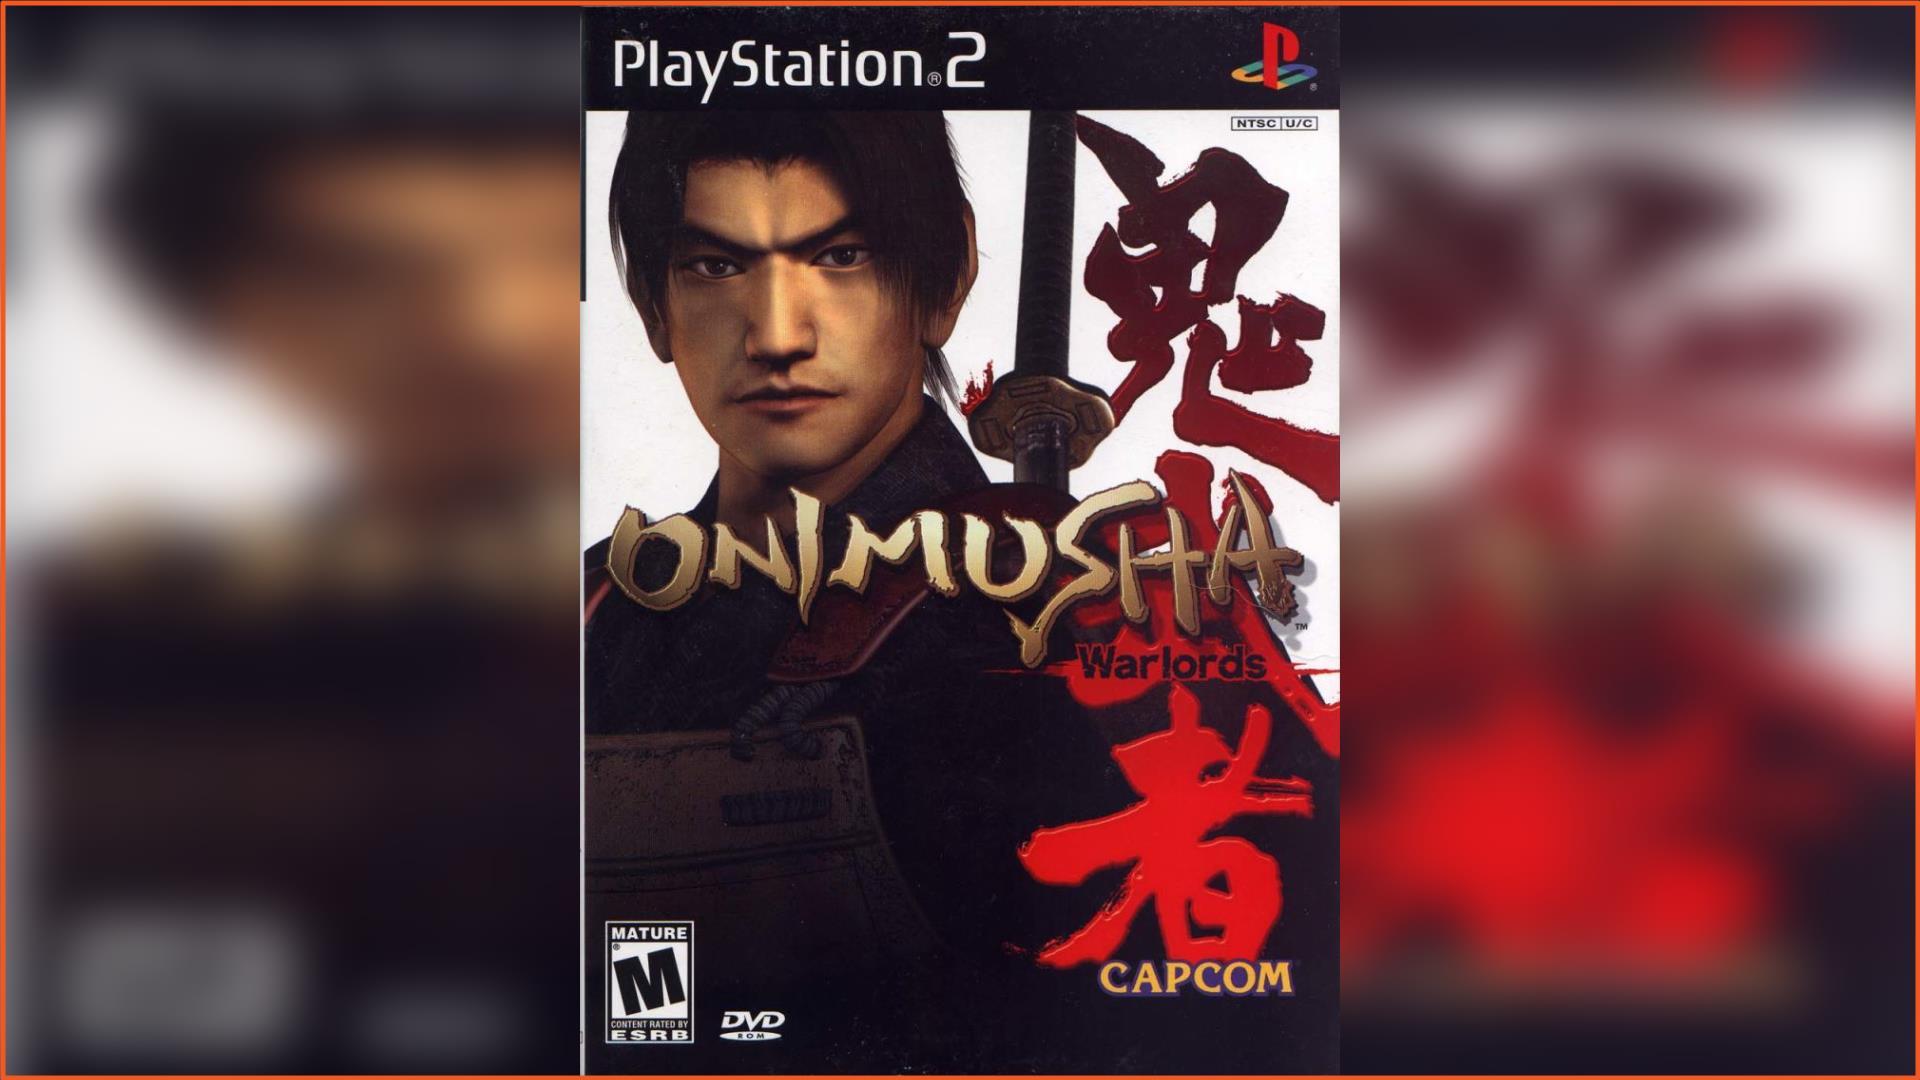 Onimusha - Warlords PS2 ISO Download